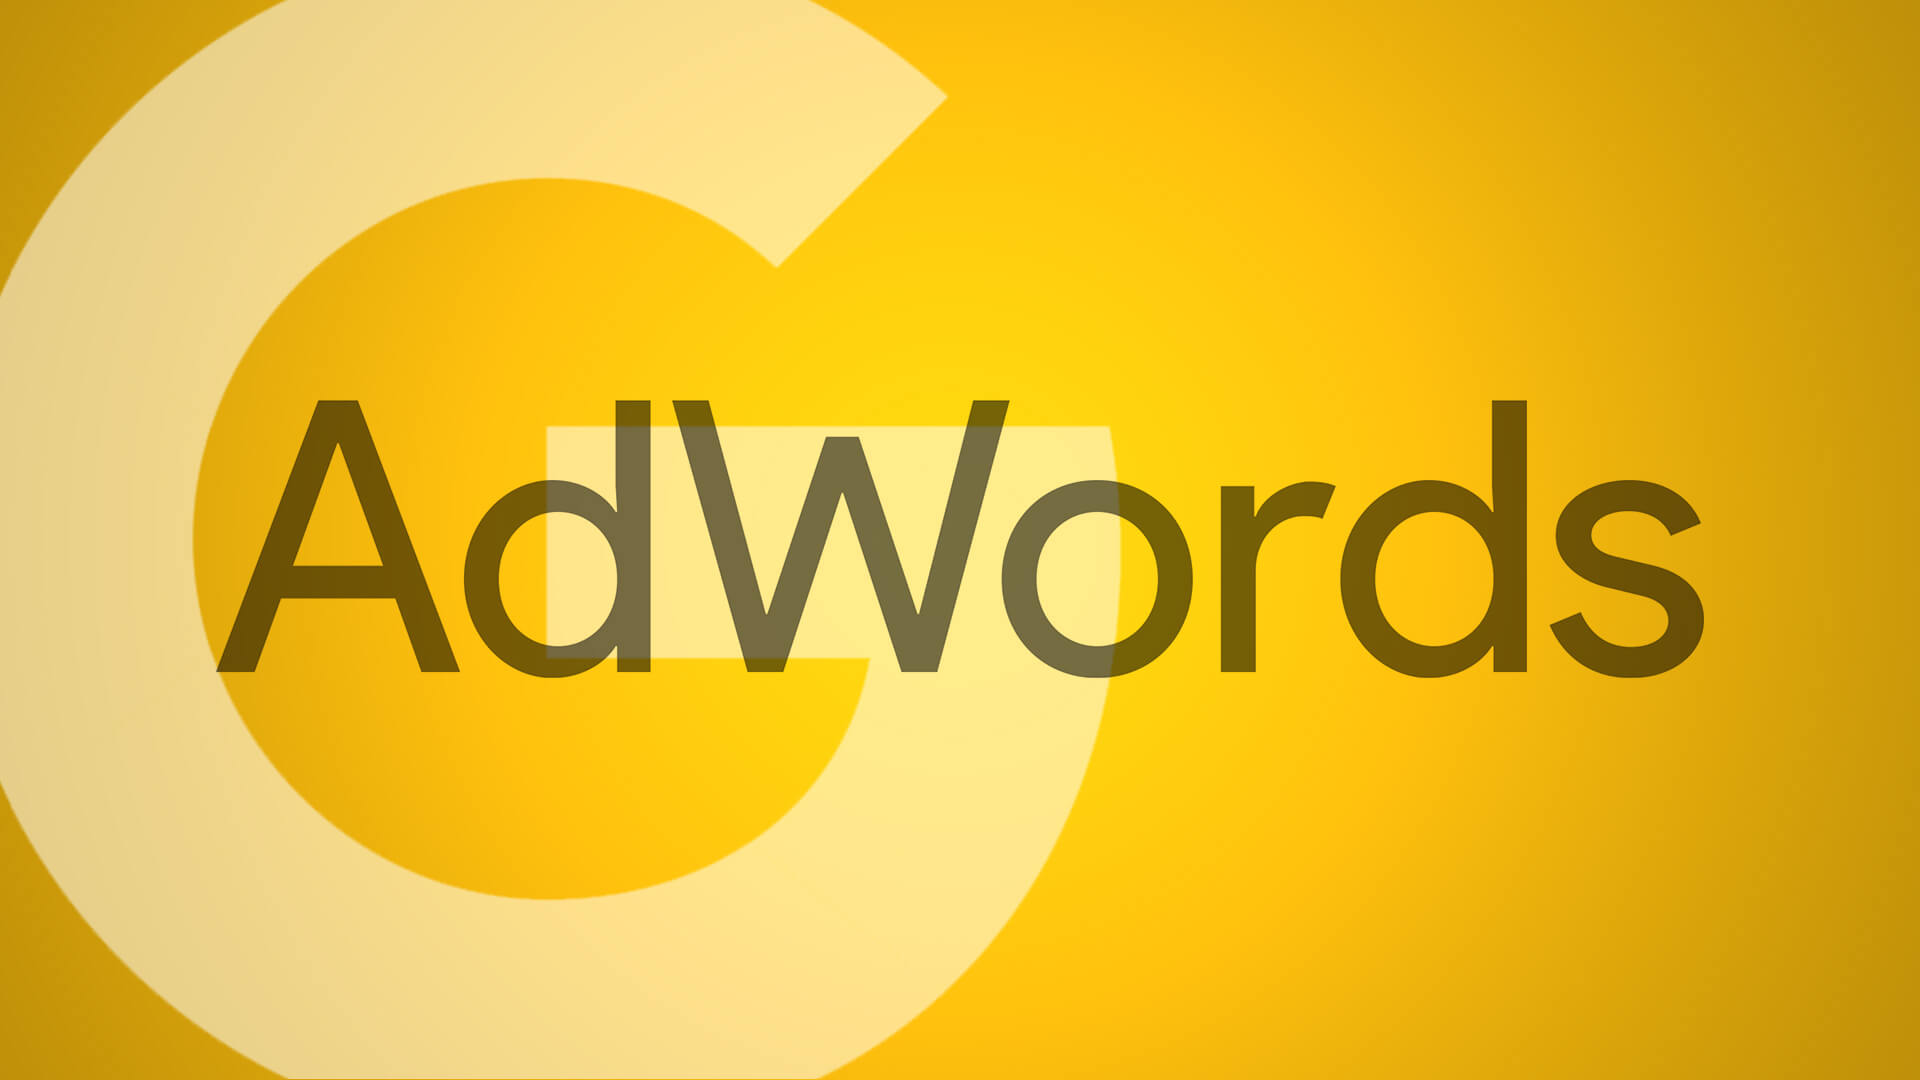 انواع کلمات کلیدی گوگل ادوردز